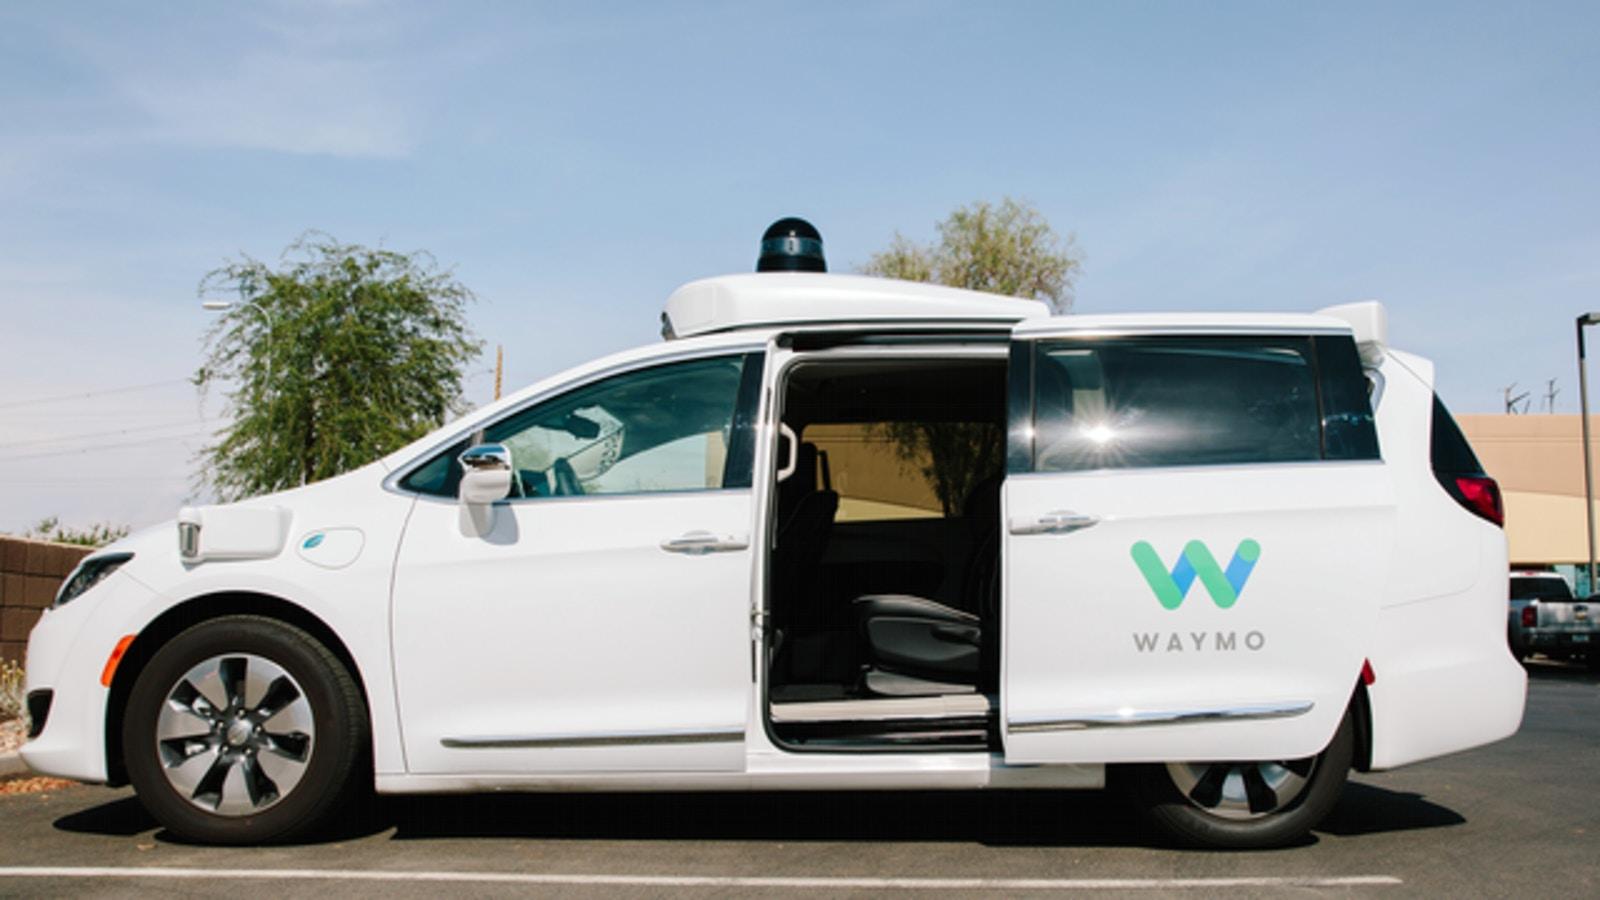 Waymo Self-Driving Technology Company